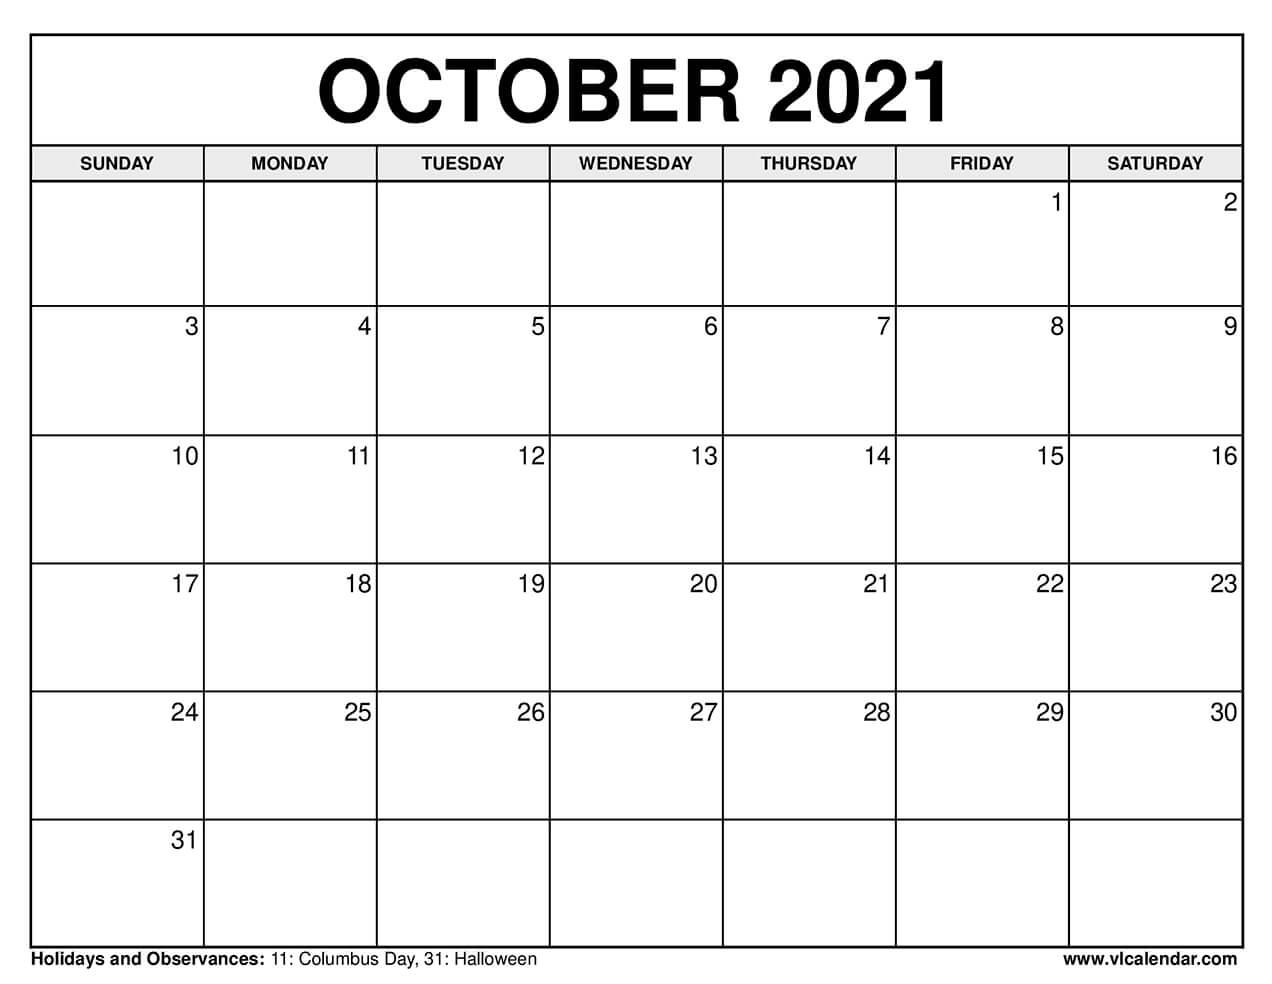 October 2021 Calendar